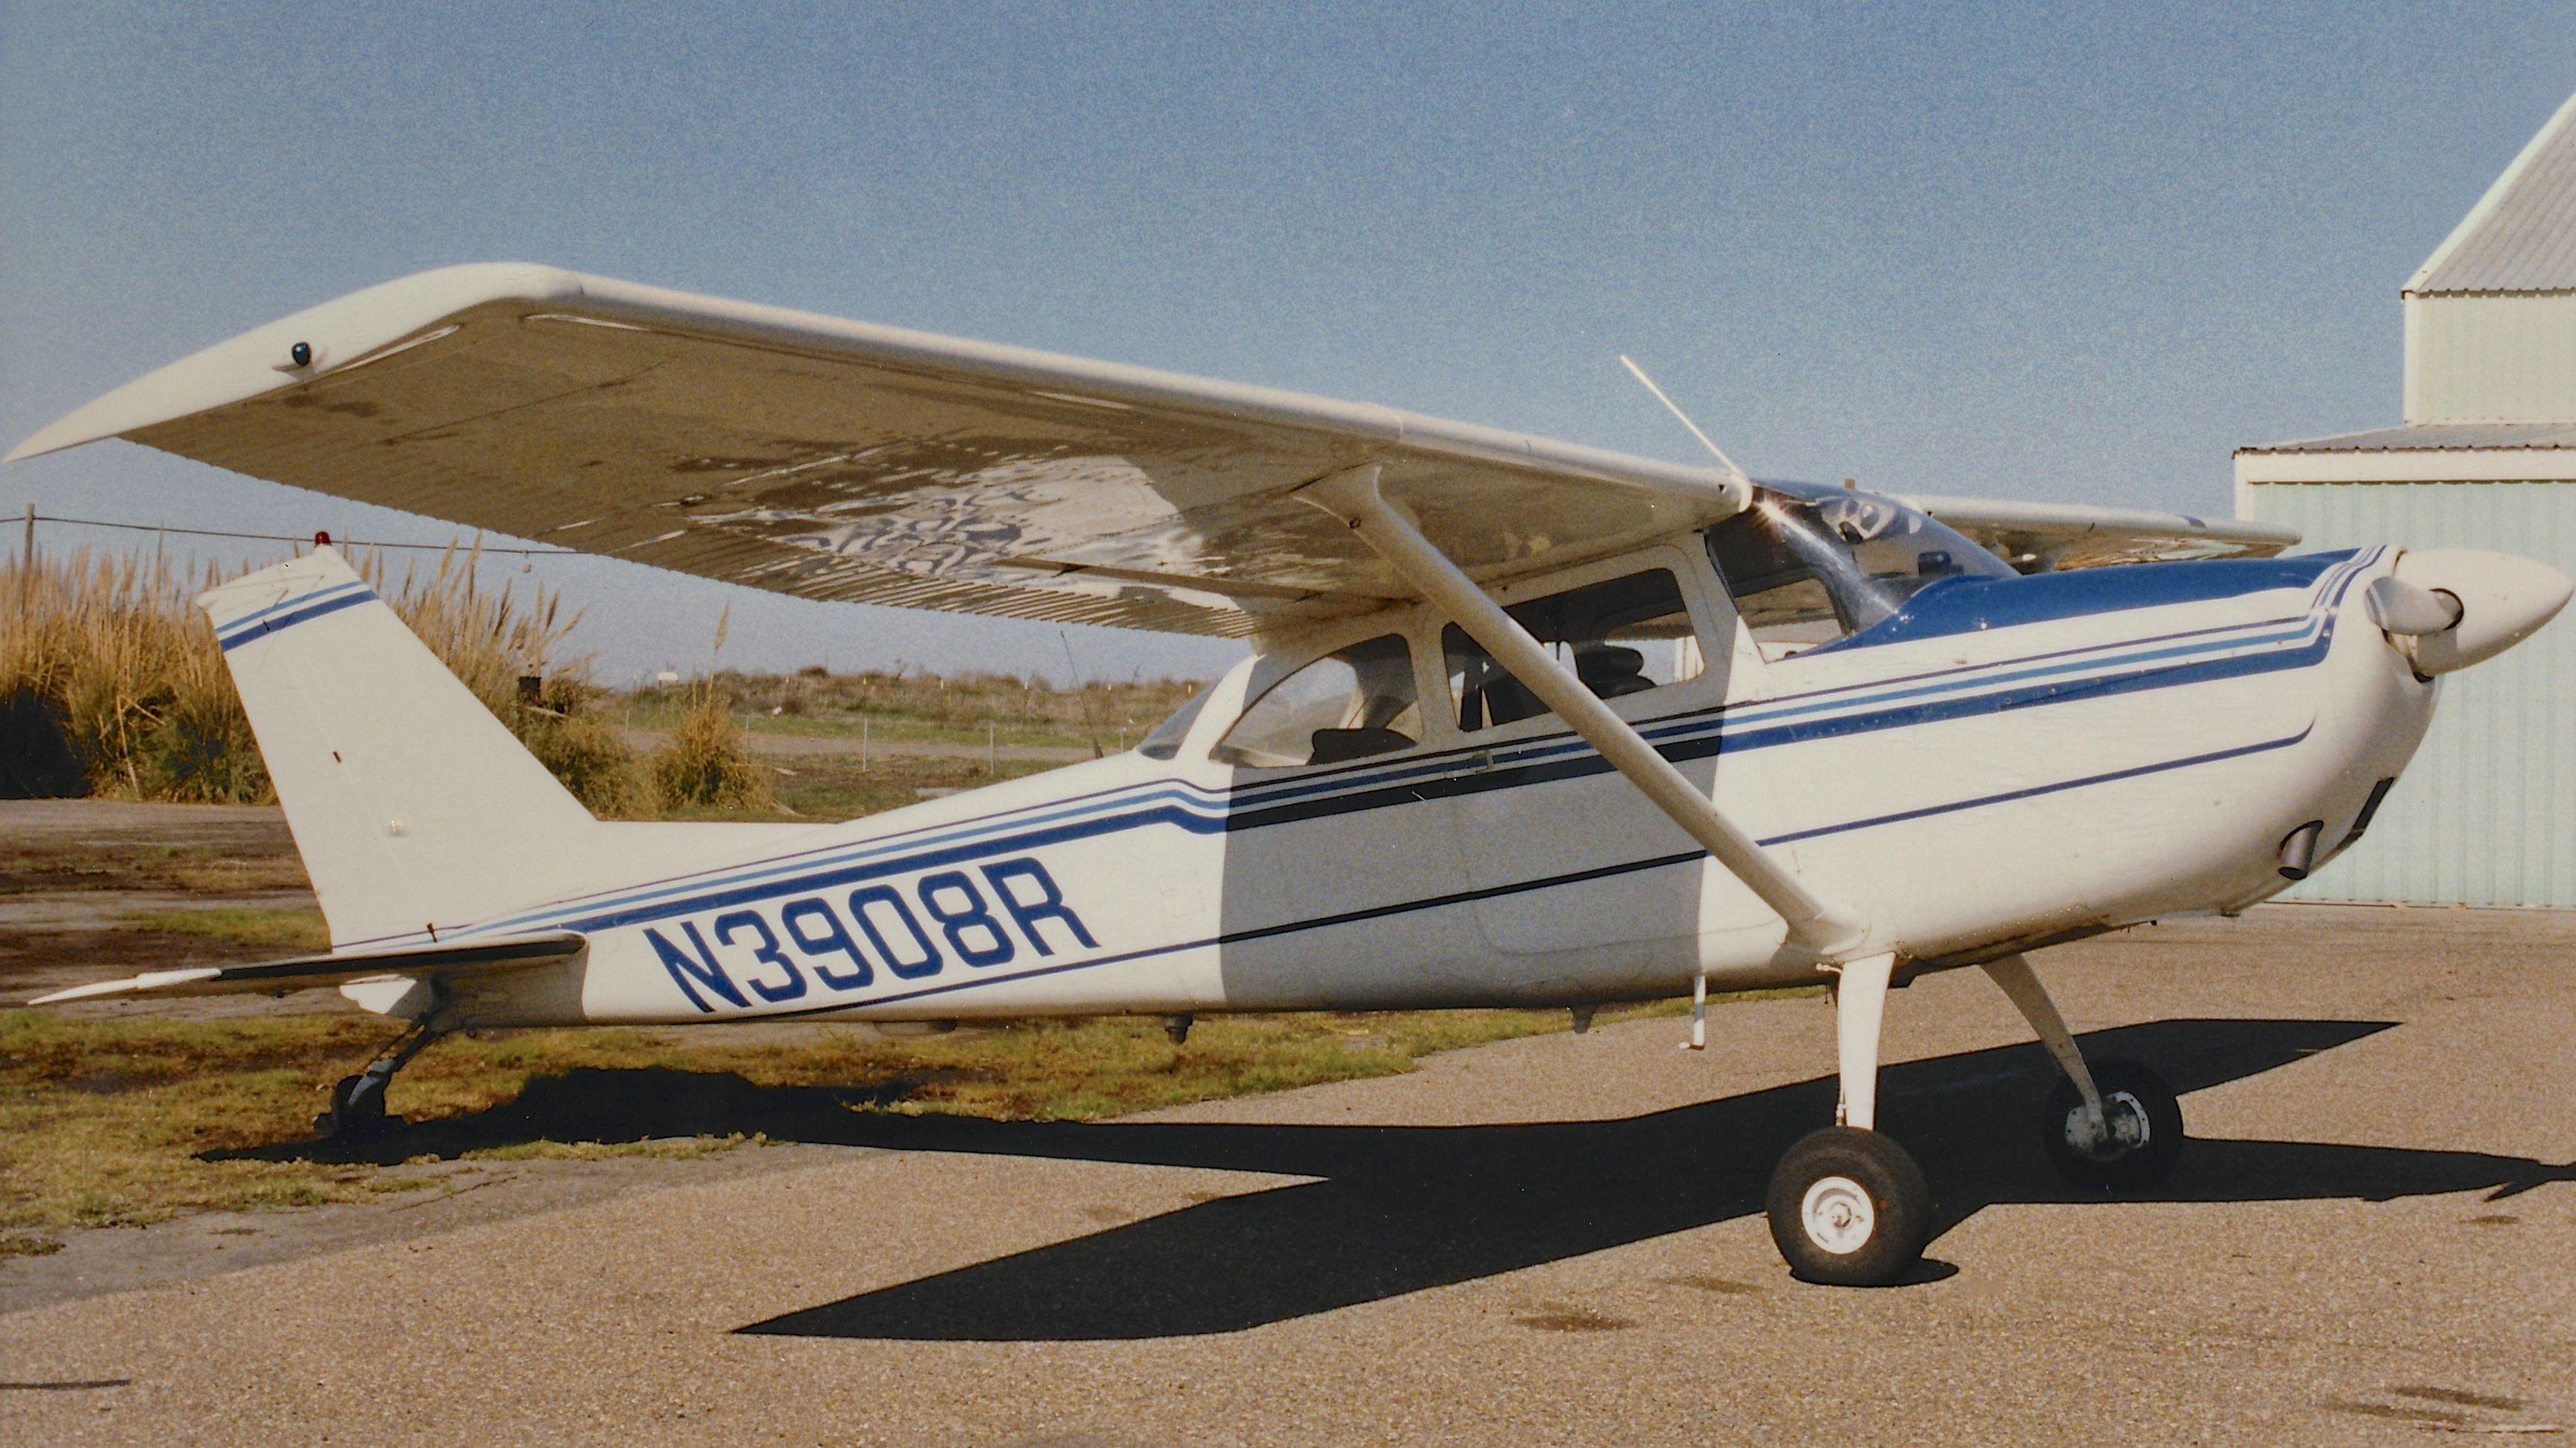 1966 Cessna 172 H N3908R  Tail wheel conversion, 180hp, long range